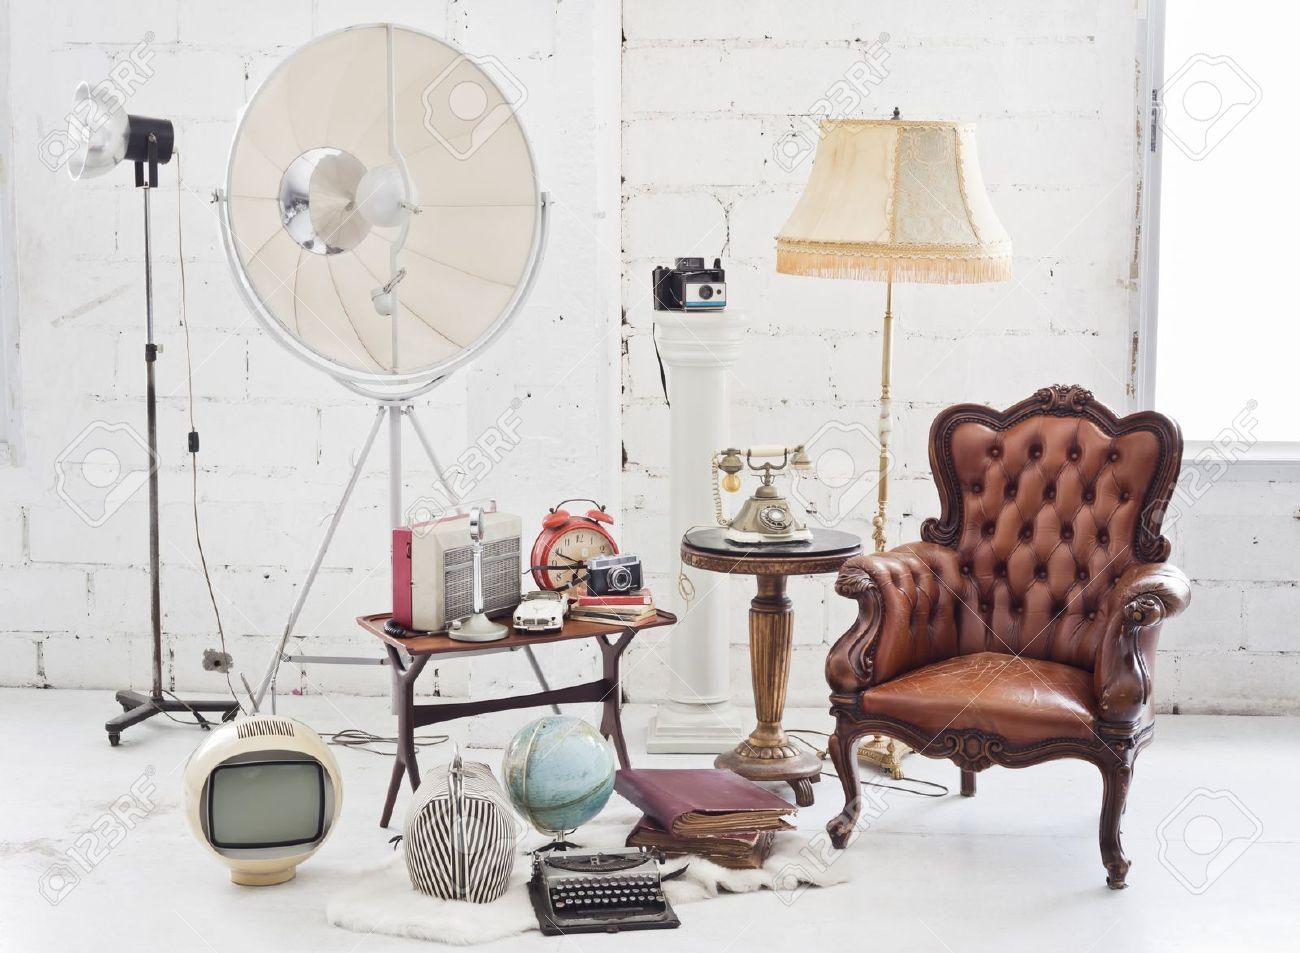 Retro Furniture And Decoration In White Room Stock Photo   11827861